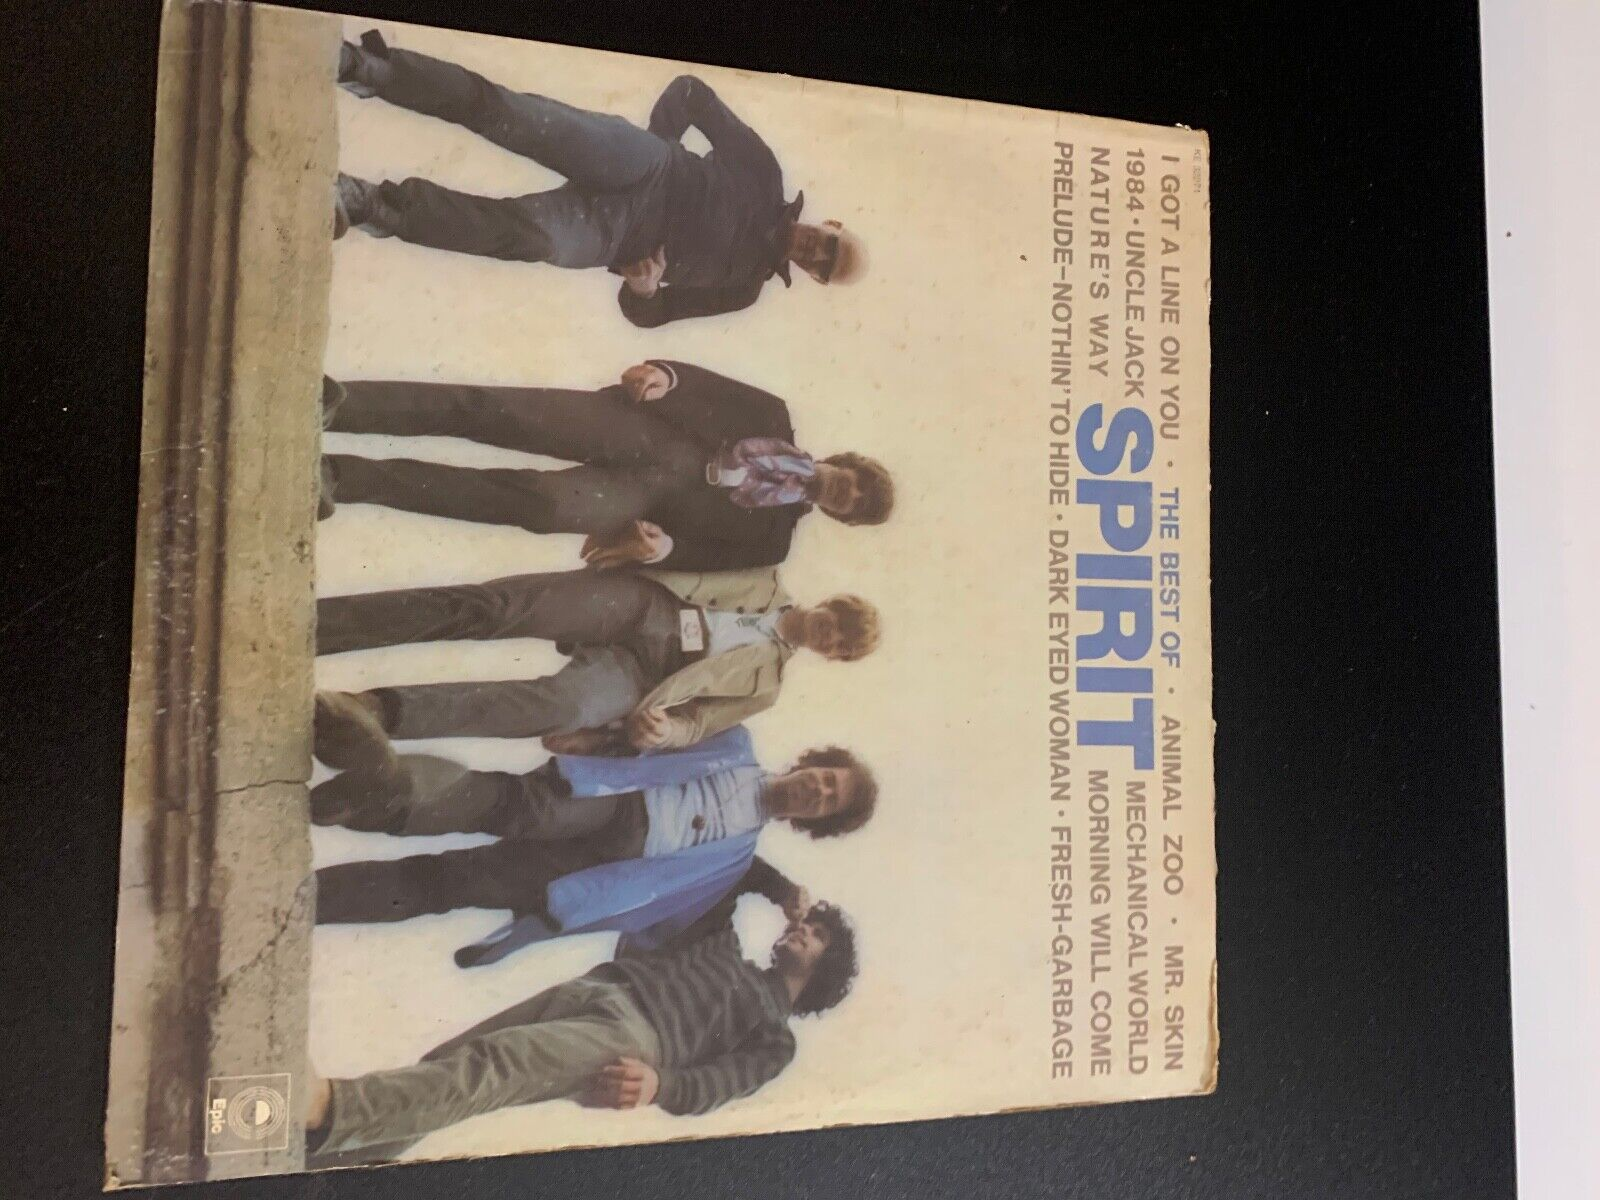 LP RECORD - SPIRIT - THE BEST OF SPIRIT - EPIC RECORDS - $9.99